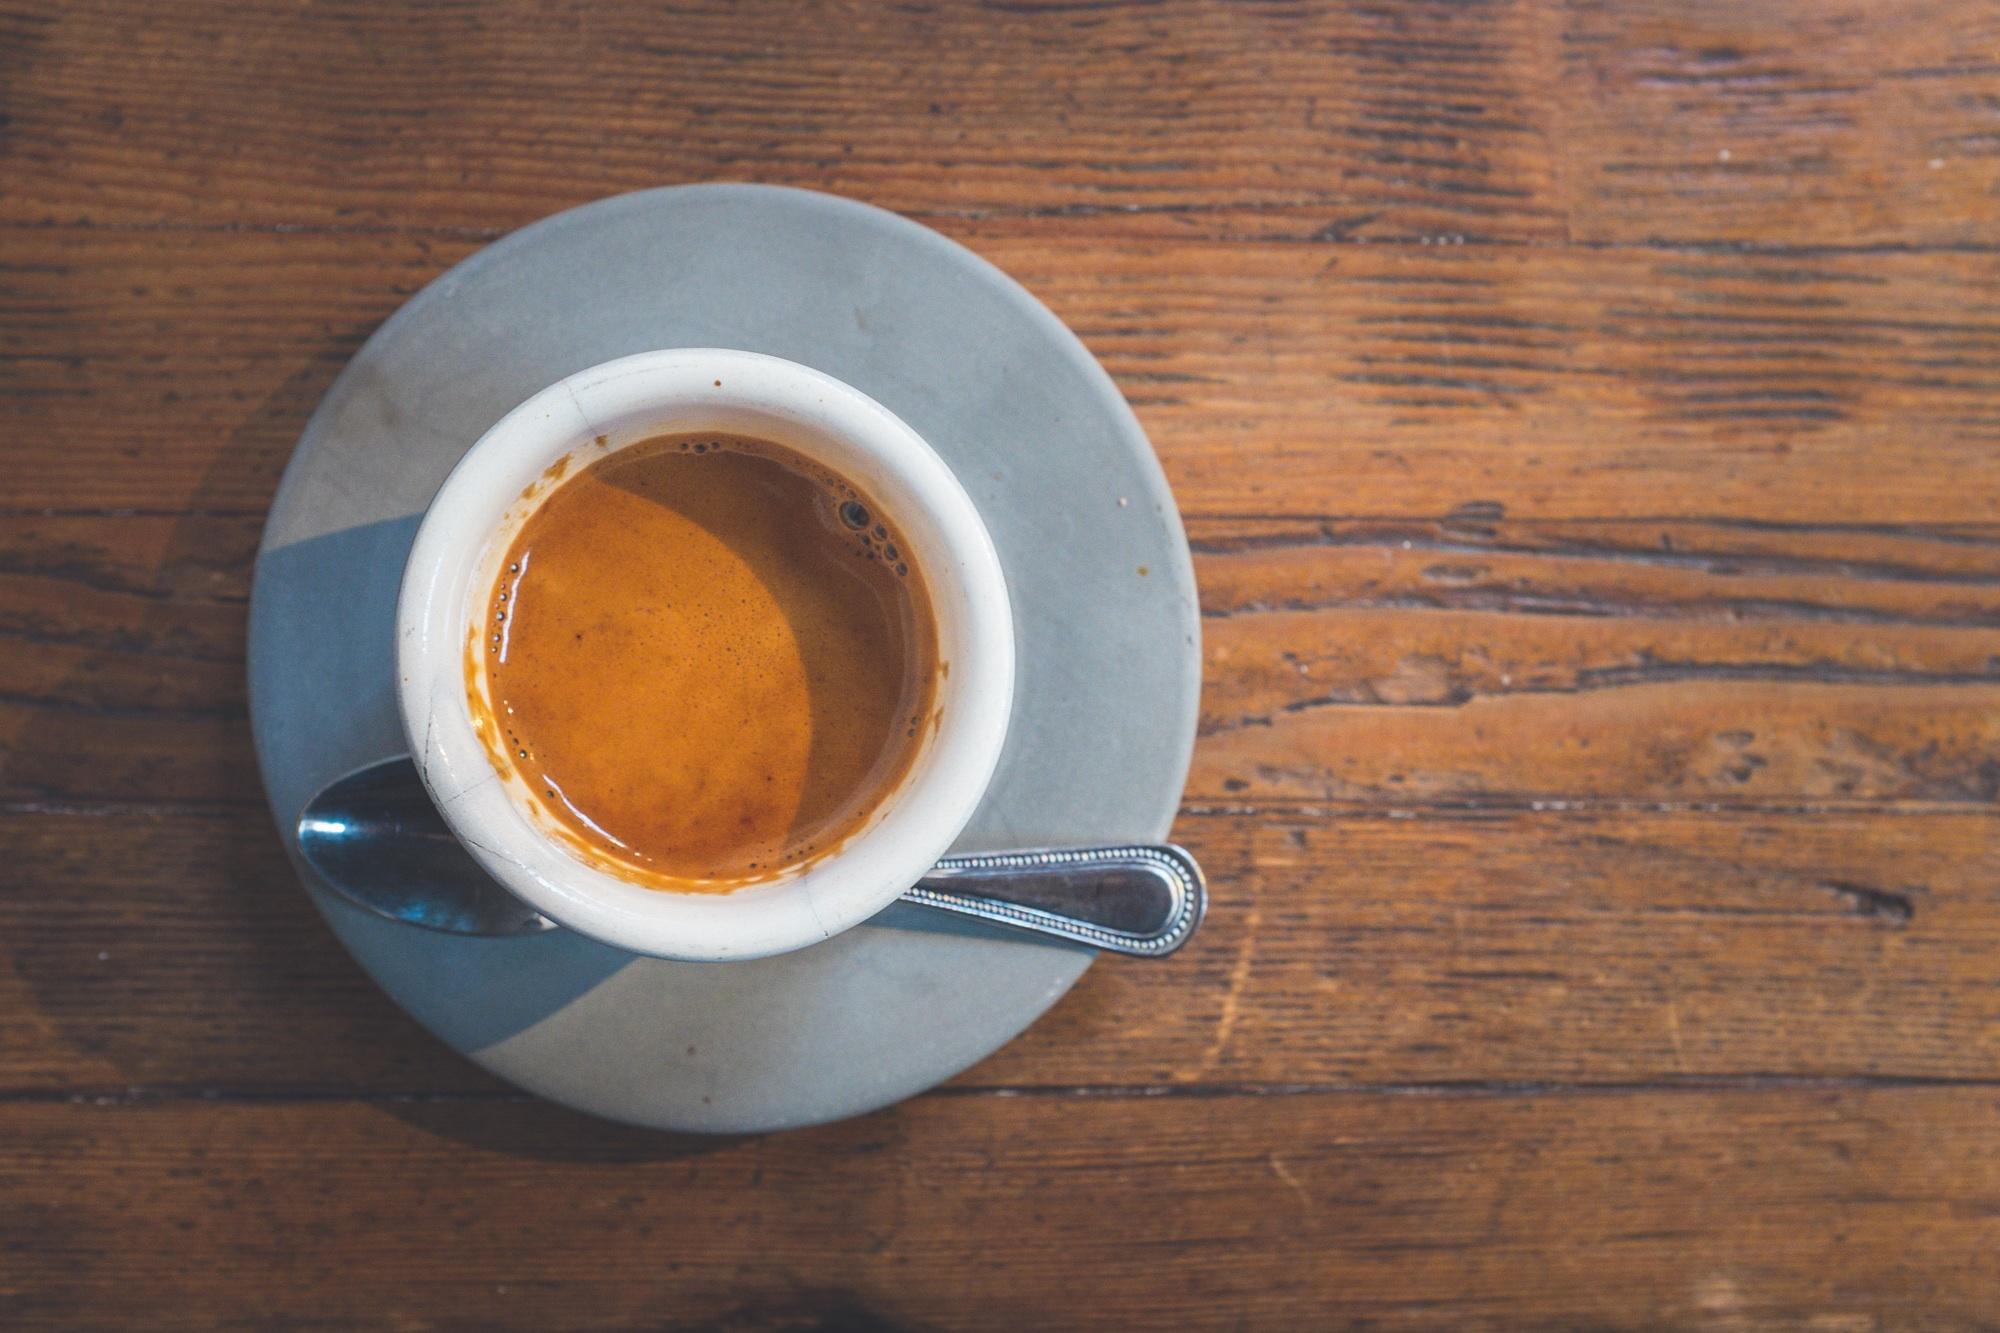 Coffee to enjoy on your Italian holidays